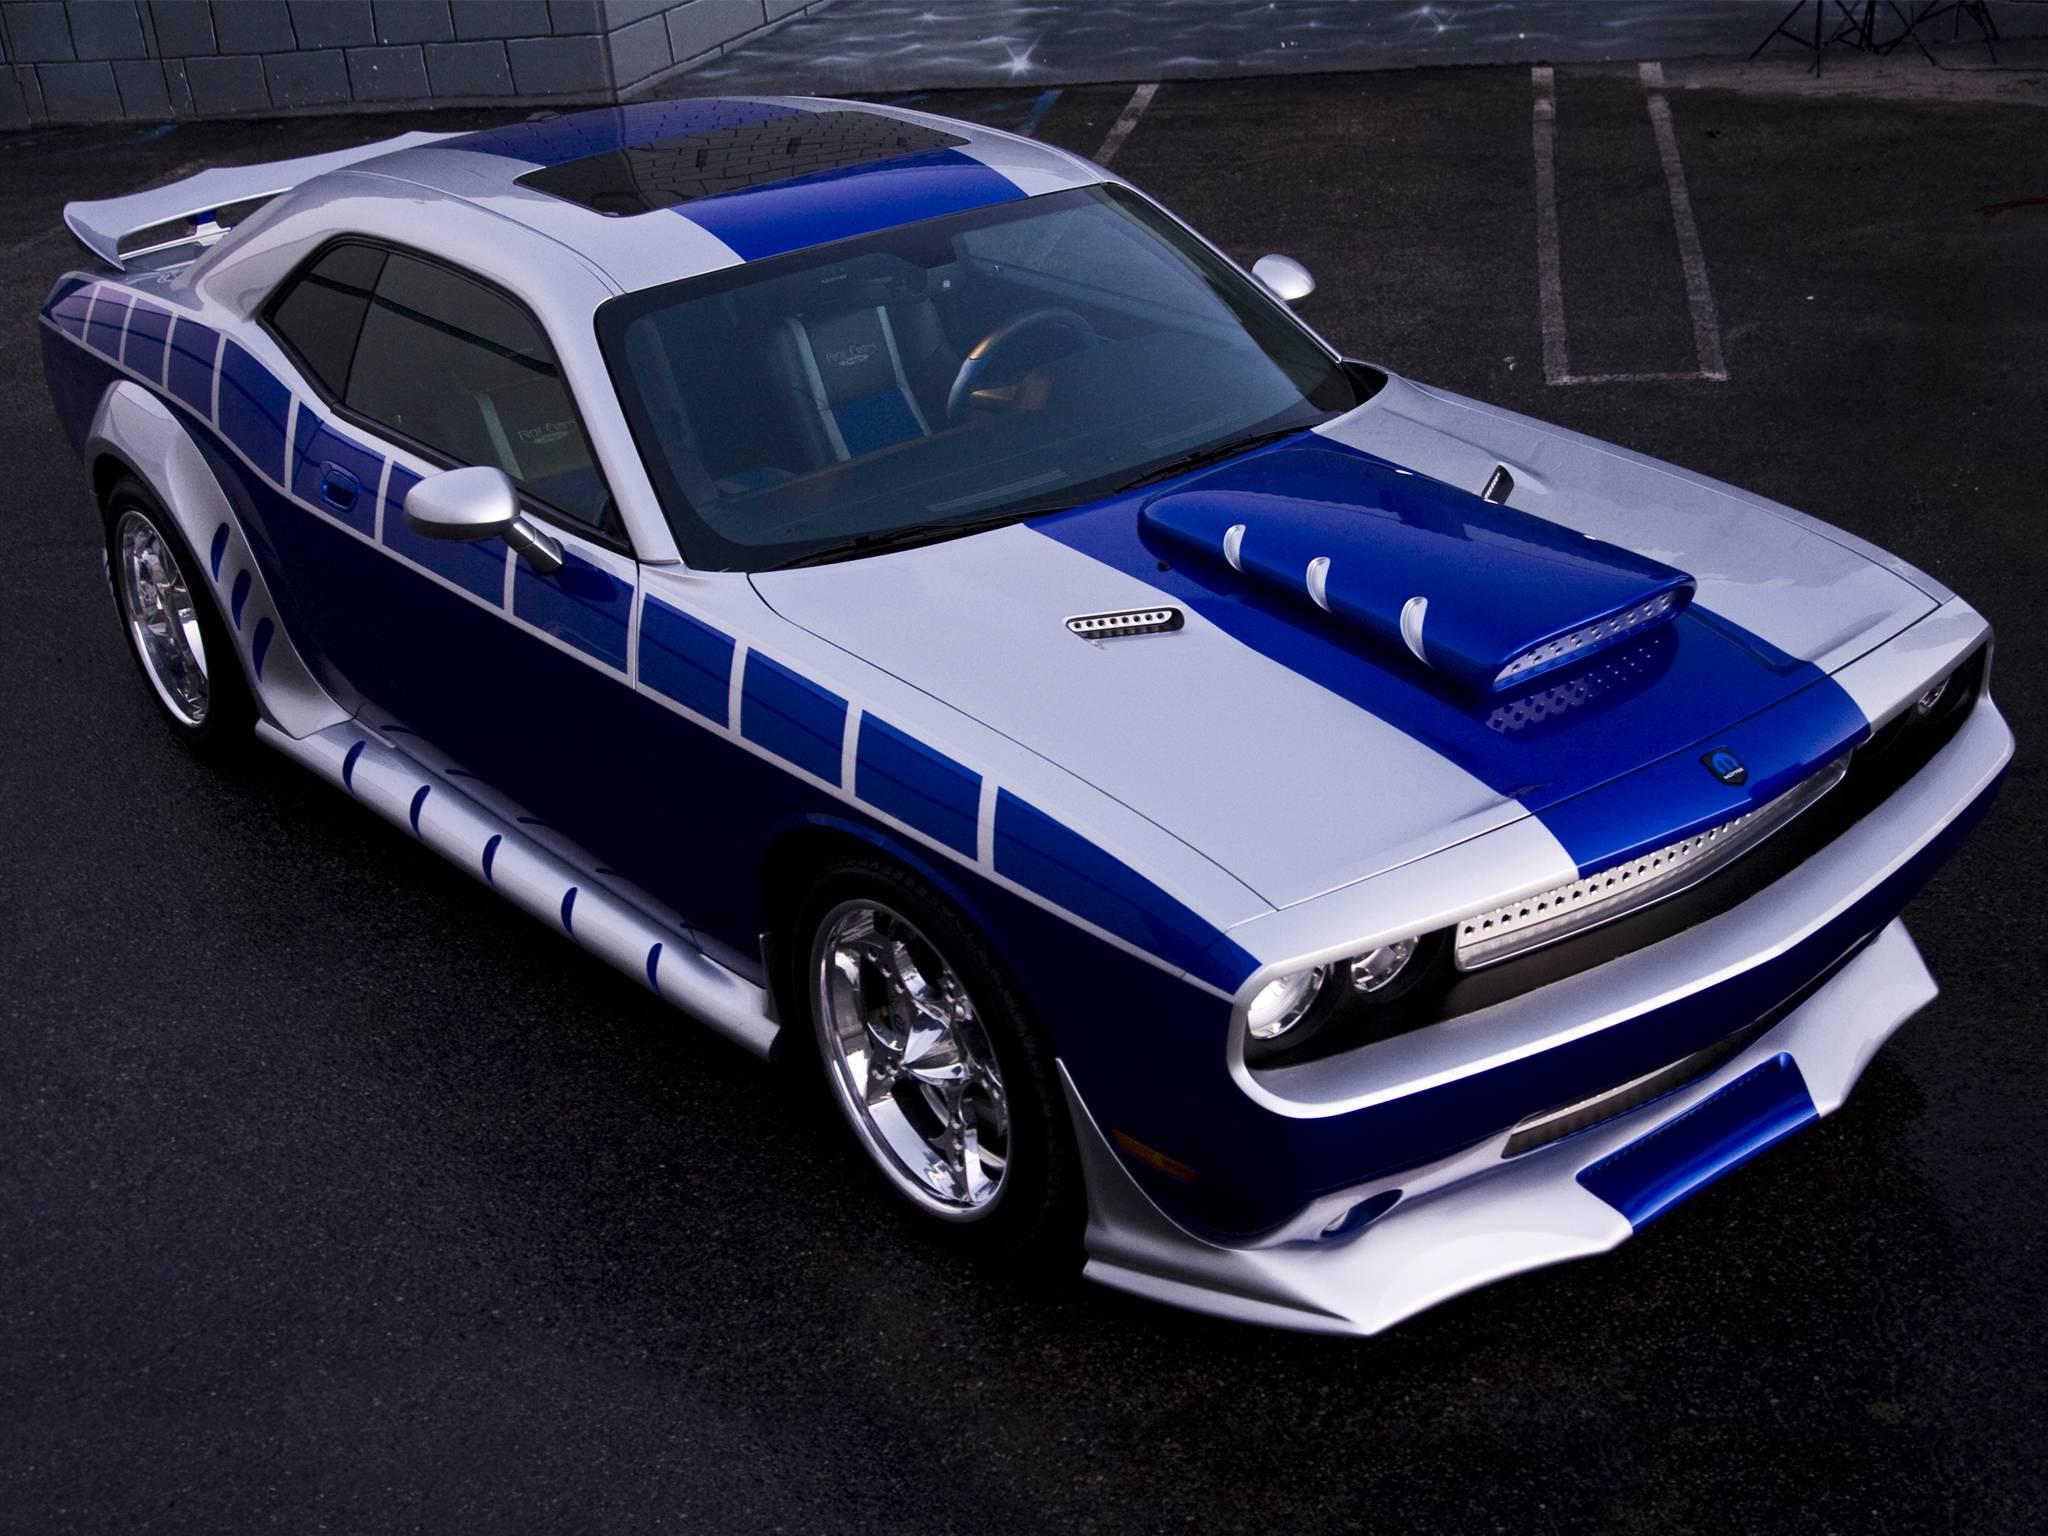 Best Sports Cars Under 5k >> Mopar Wallpapers - Wallpaper Cave